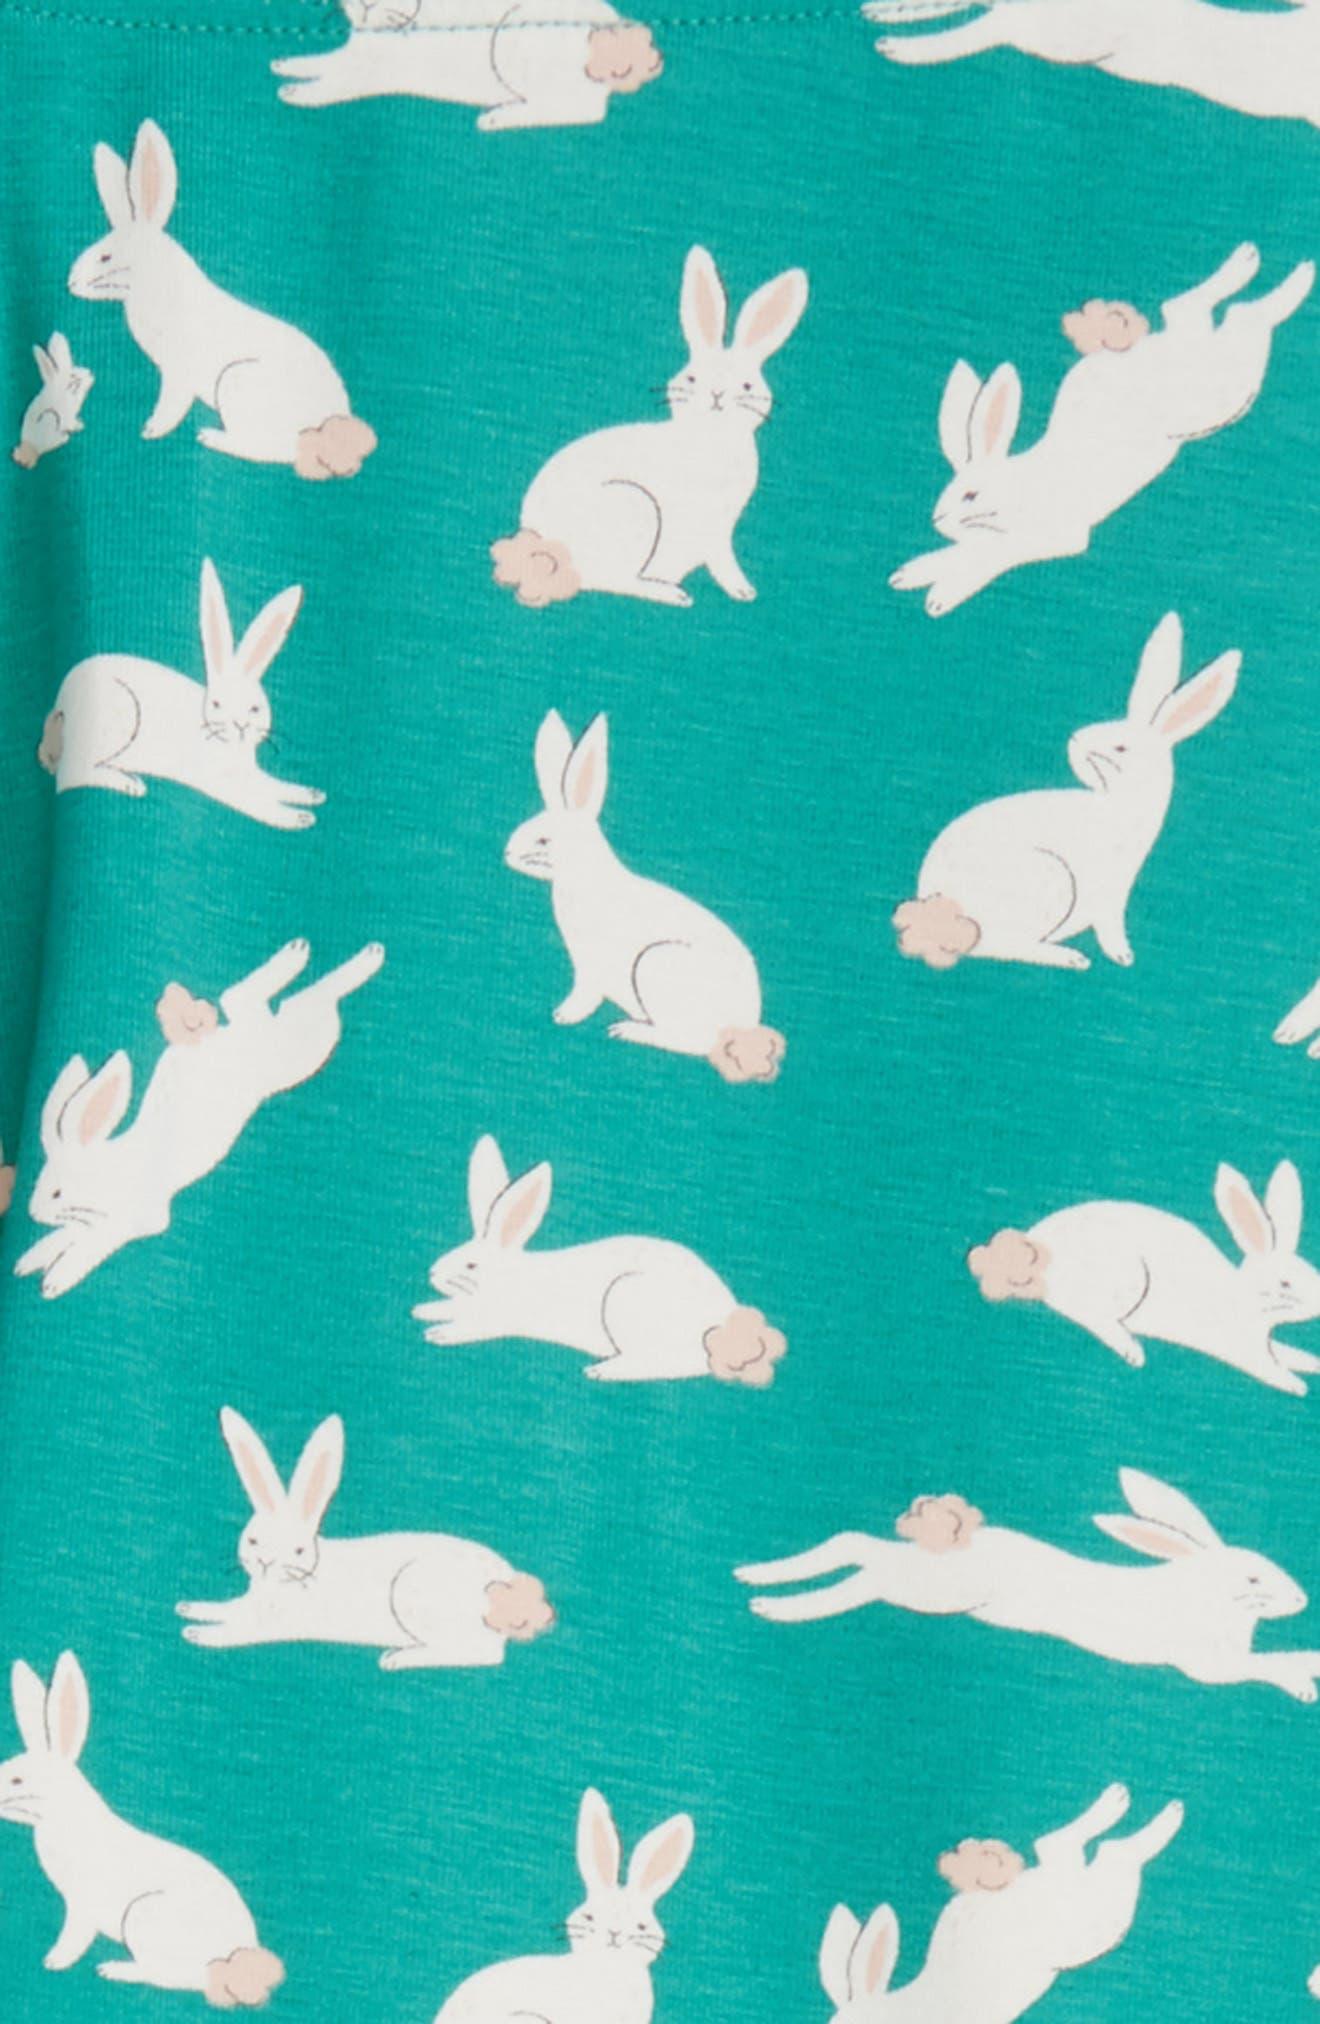 Fun Leggings,                             Alternate thumbnail 2, color,                             Soft Lily Pad Green Bunnies